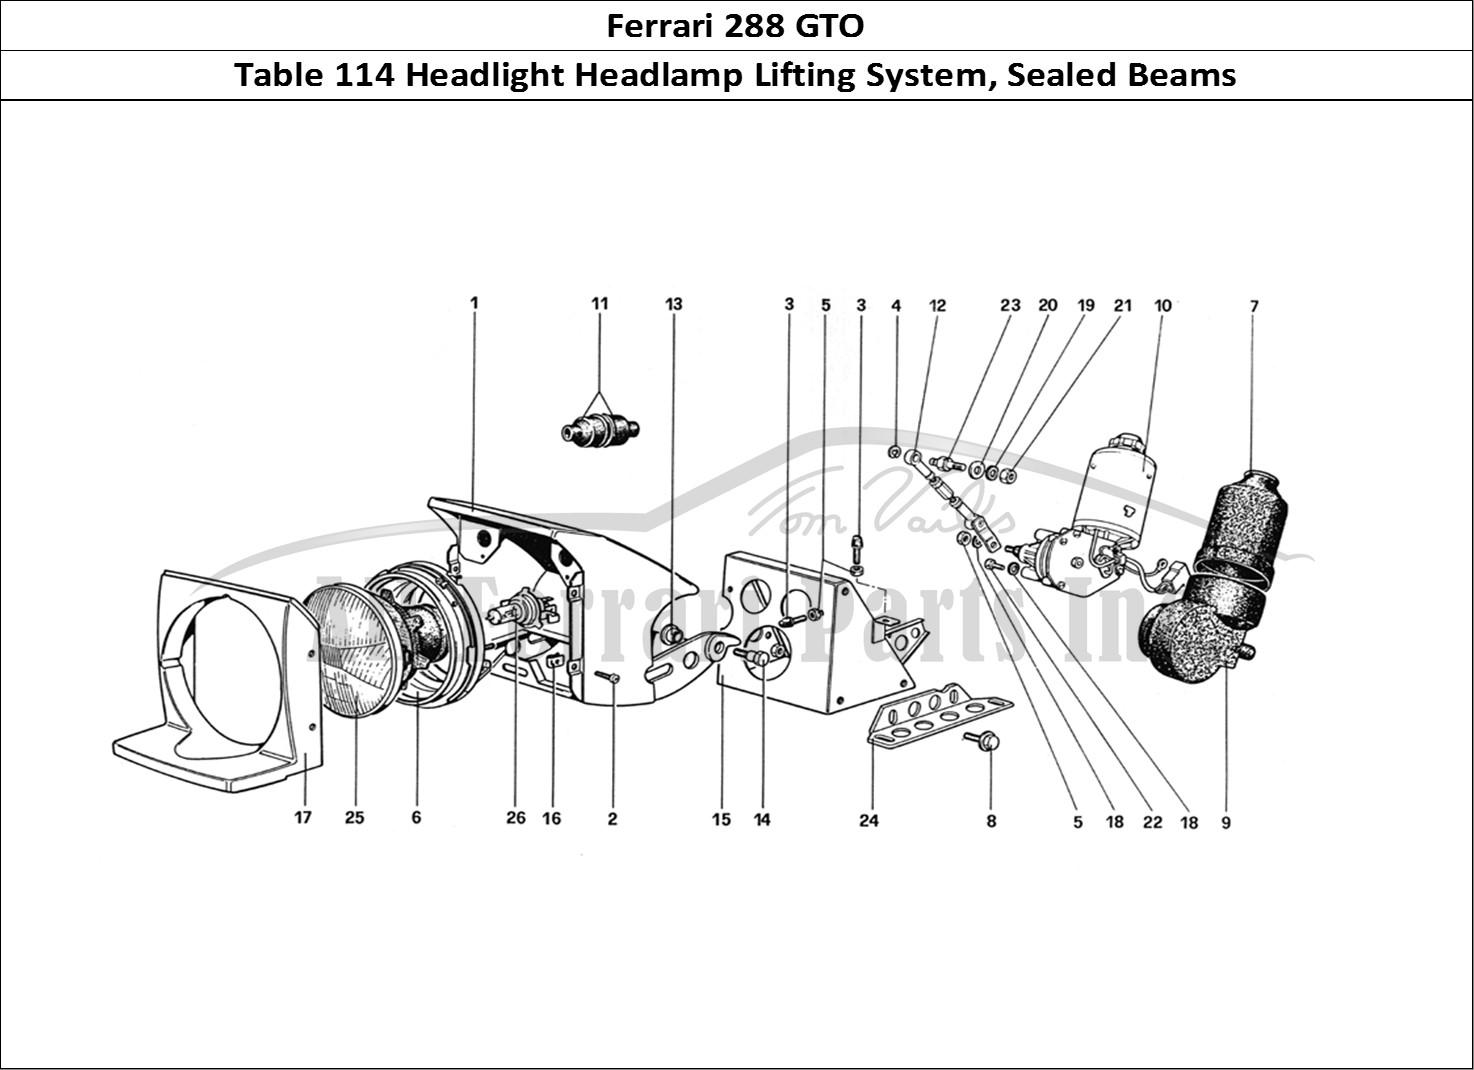 Buy original Ferrari 288 GTO 114 Headlight Headlamp